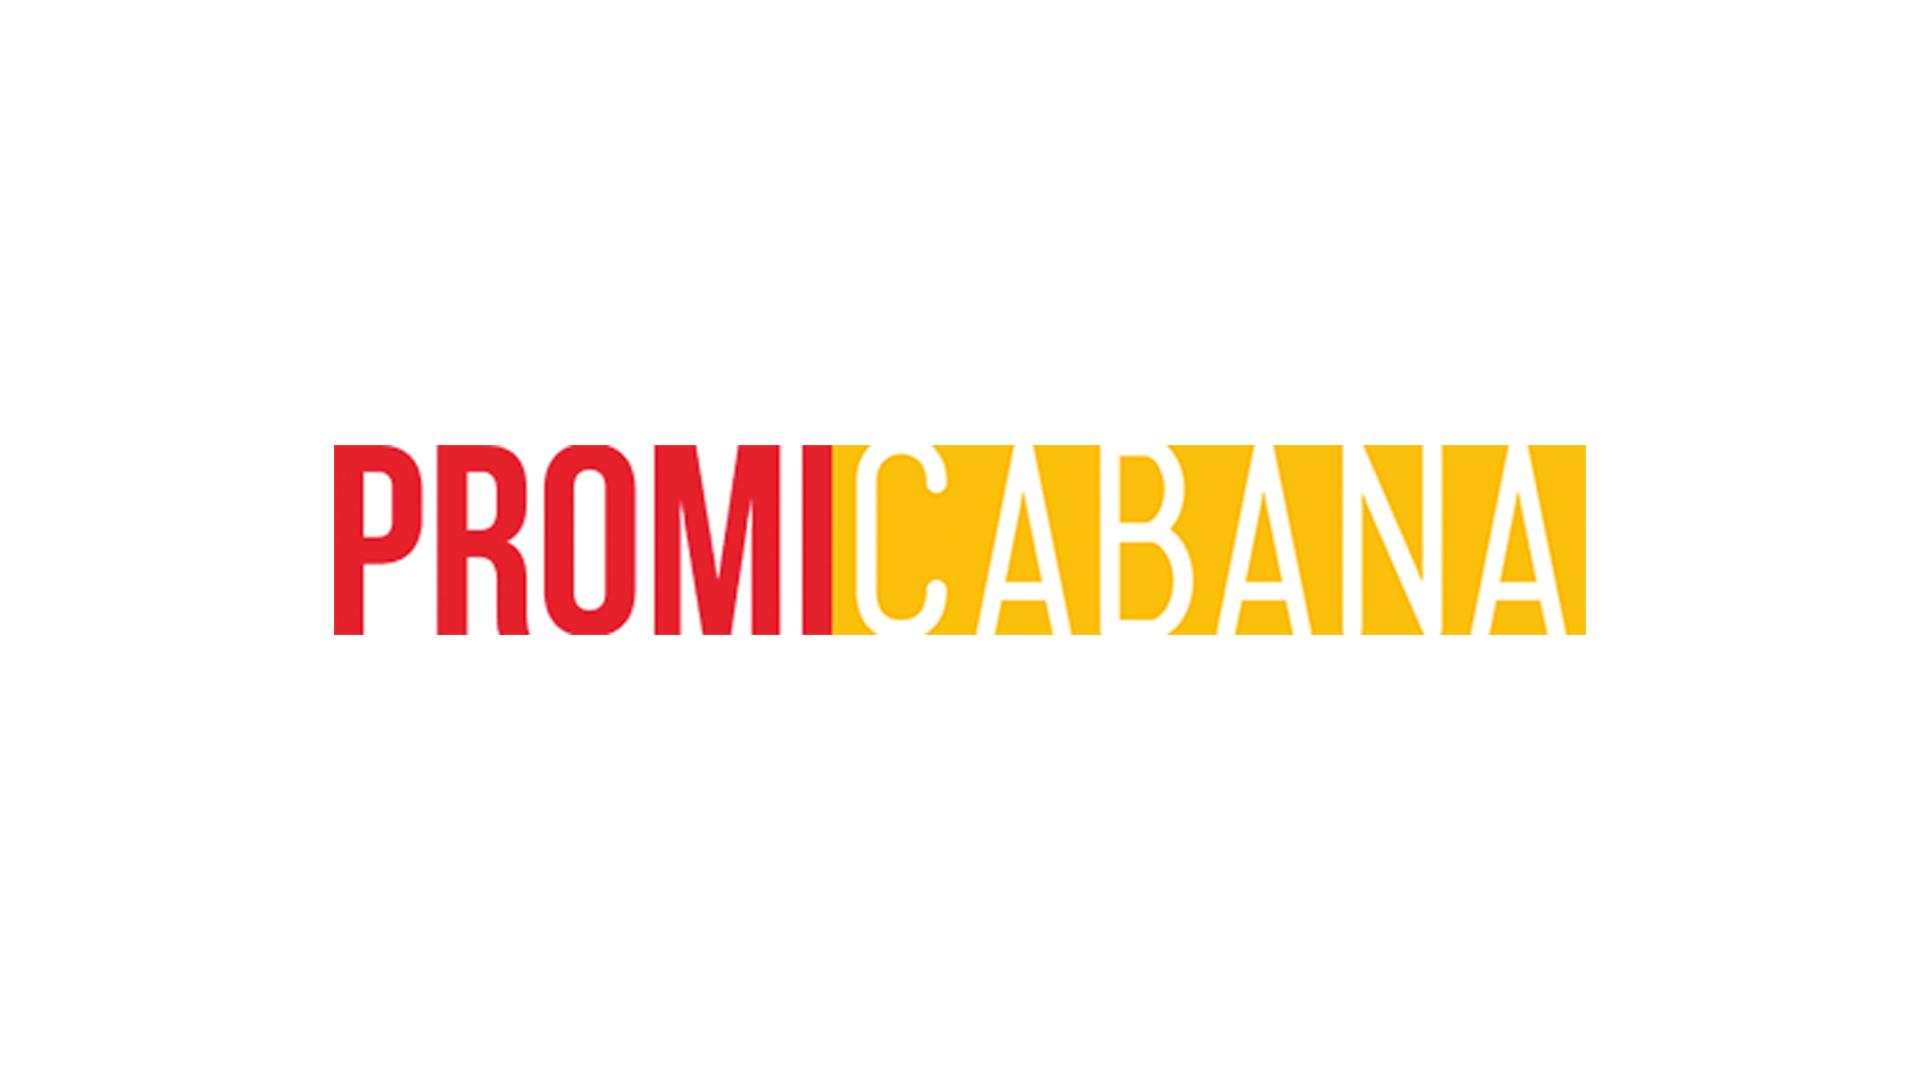 Christina-Aguilera-Anywhere-But-Here-Lyric-Video